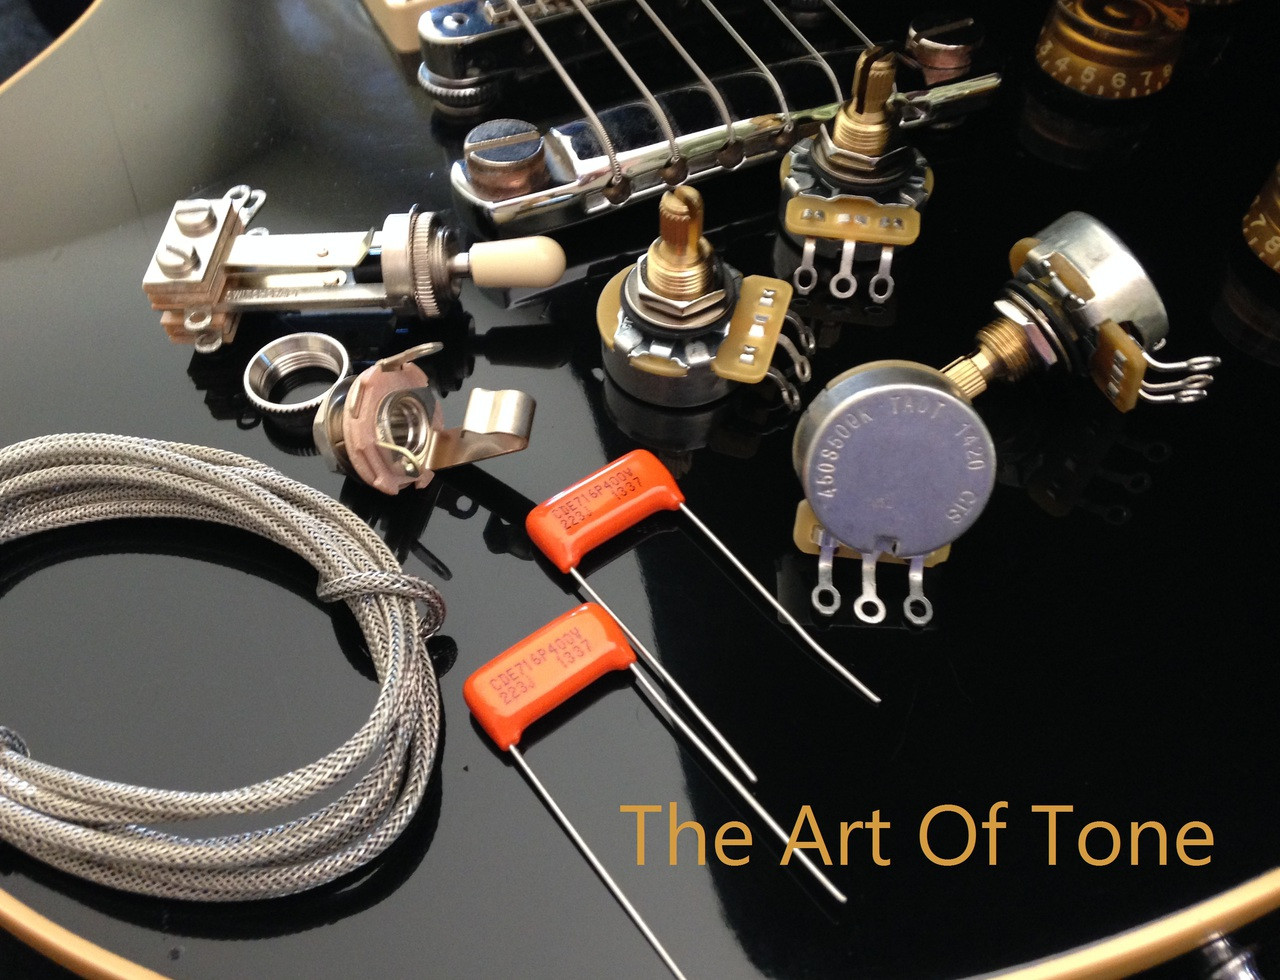 Les Paul Wiring Kit Diagram Schemes Schematics Deluxe Short Shaft For Gibson Usa Guitars Rh Theartoftone Com Seymour Duncan